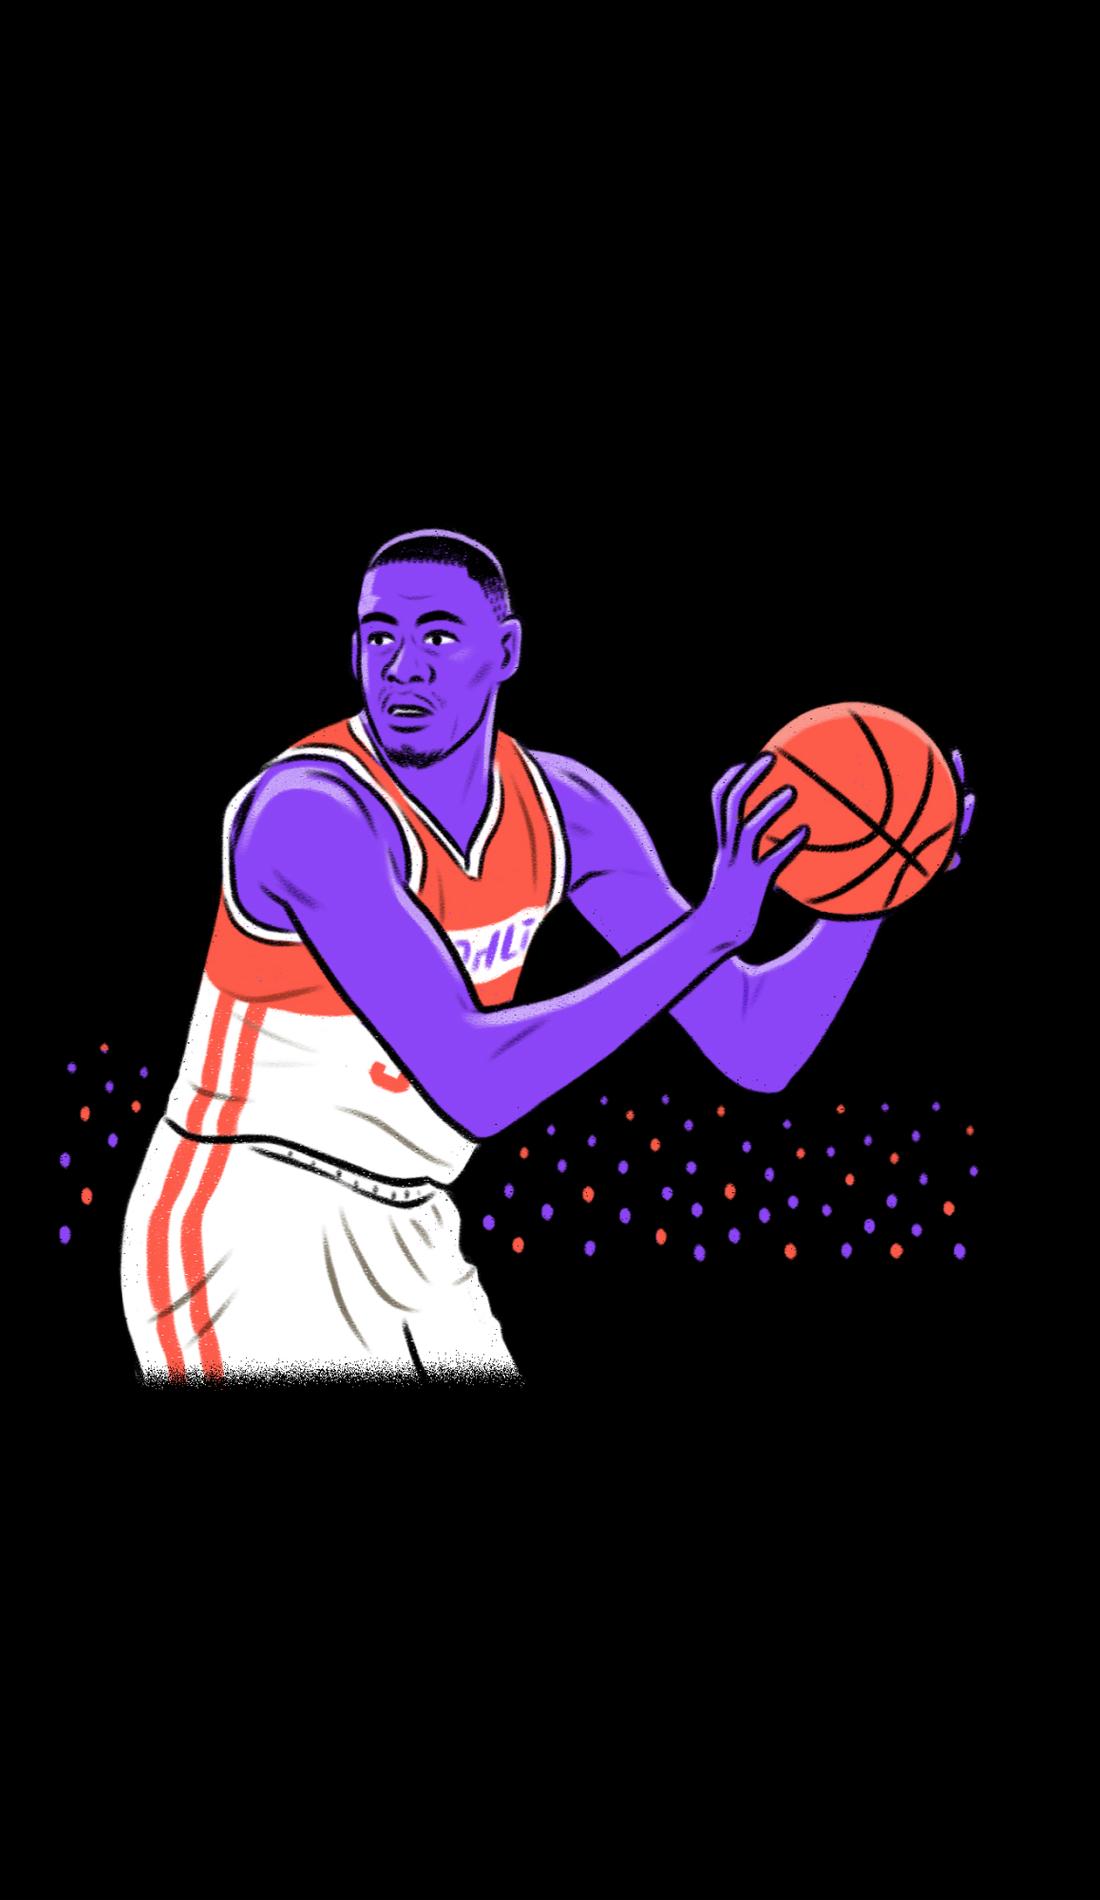 A Iona Gaels Basketball live event